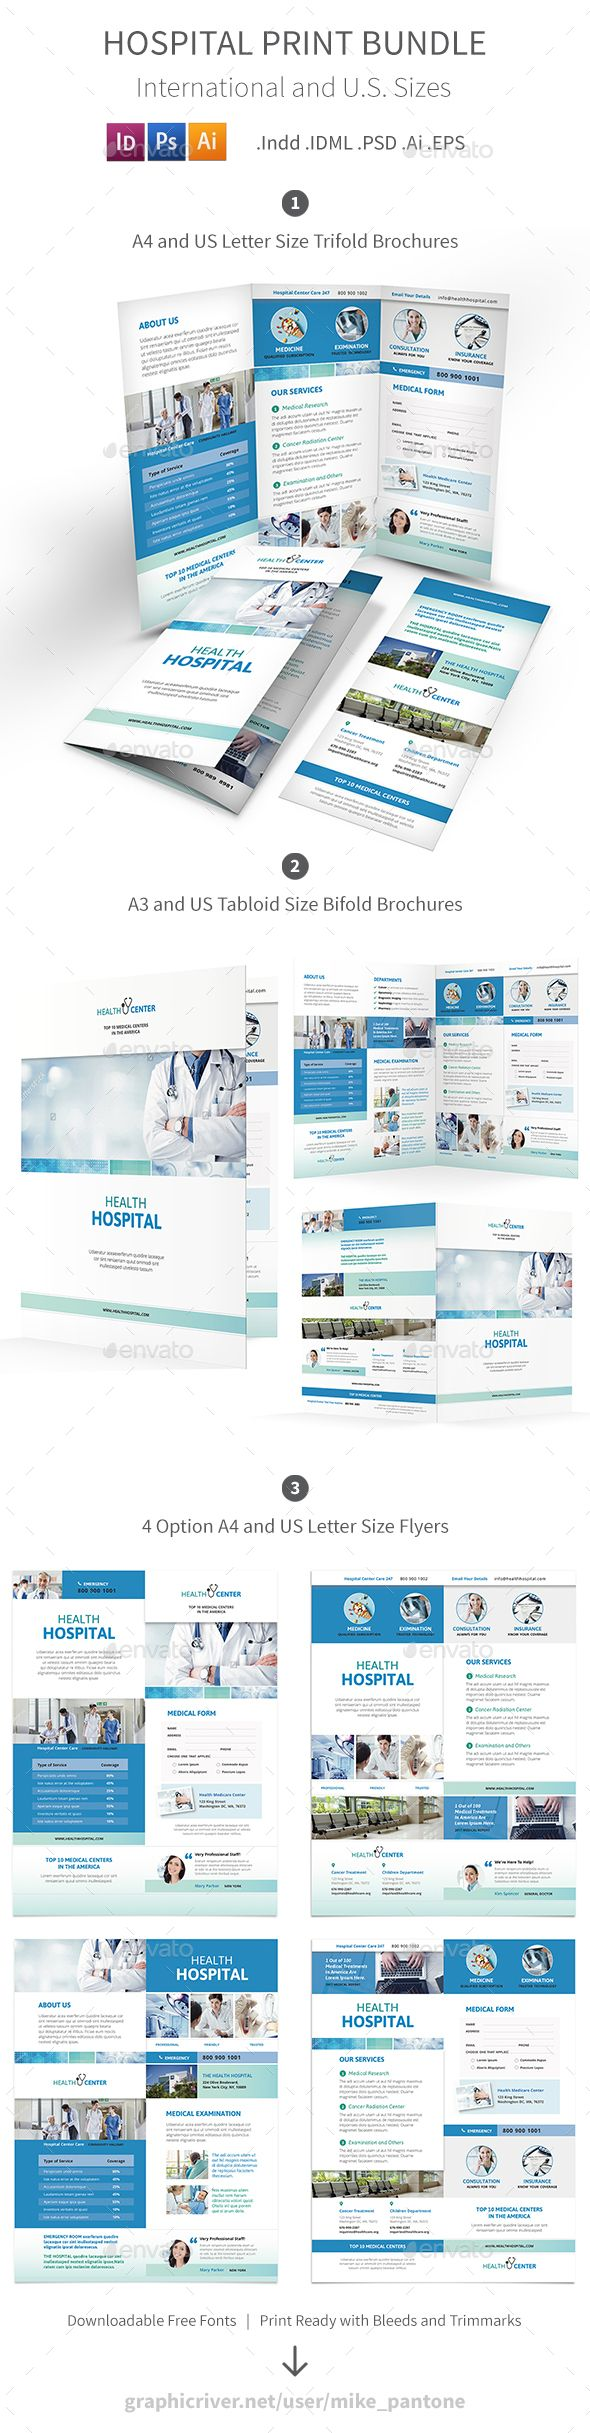 Hospital Print Bundle